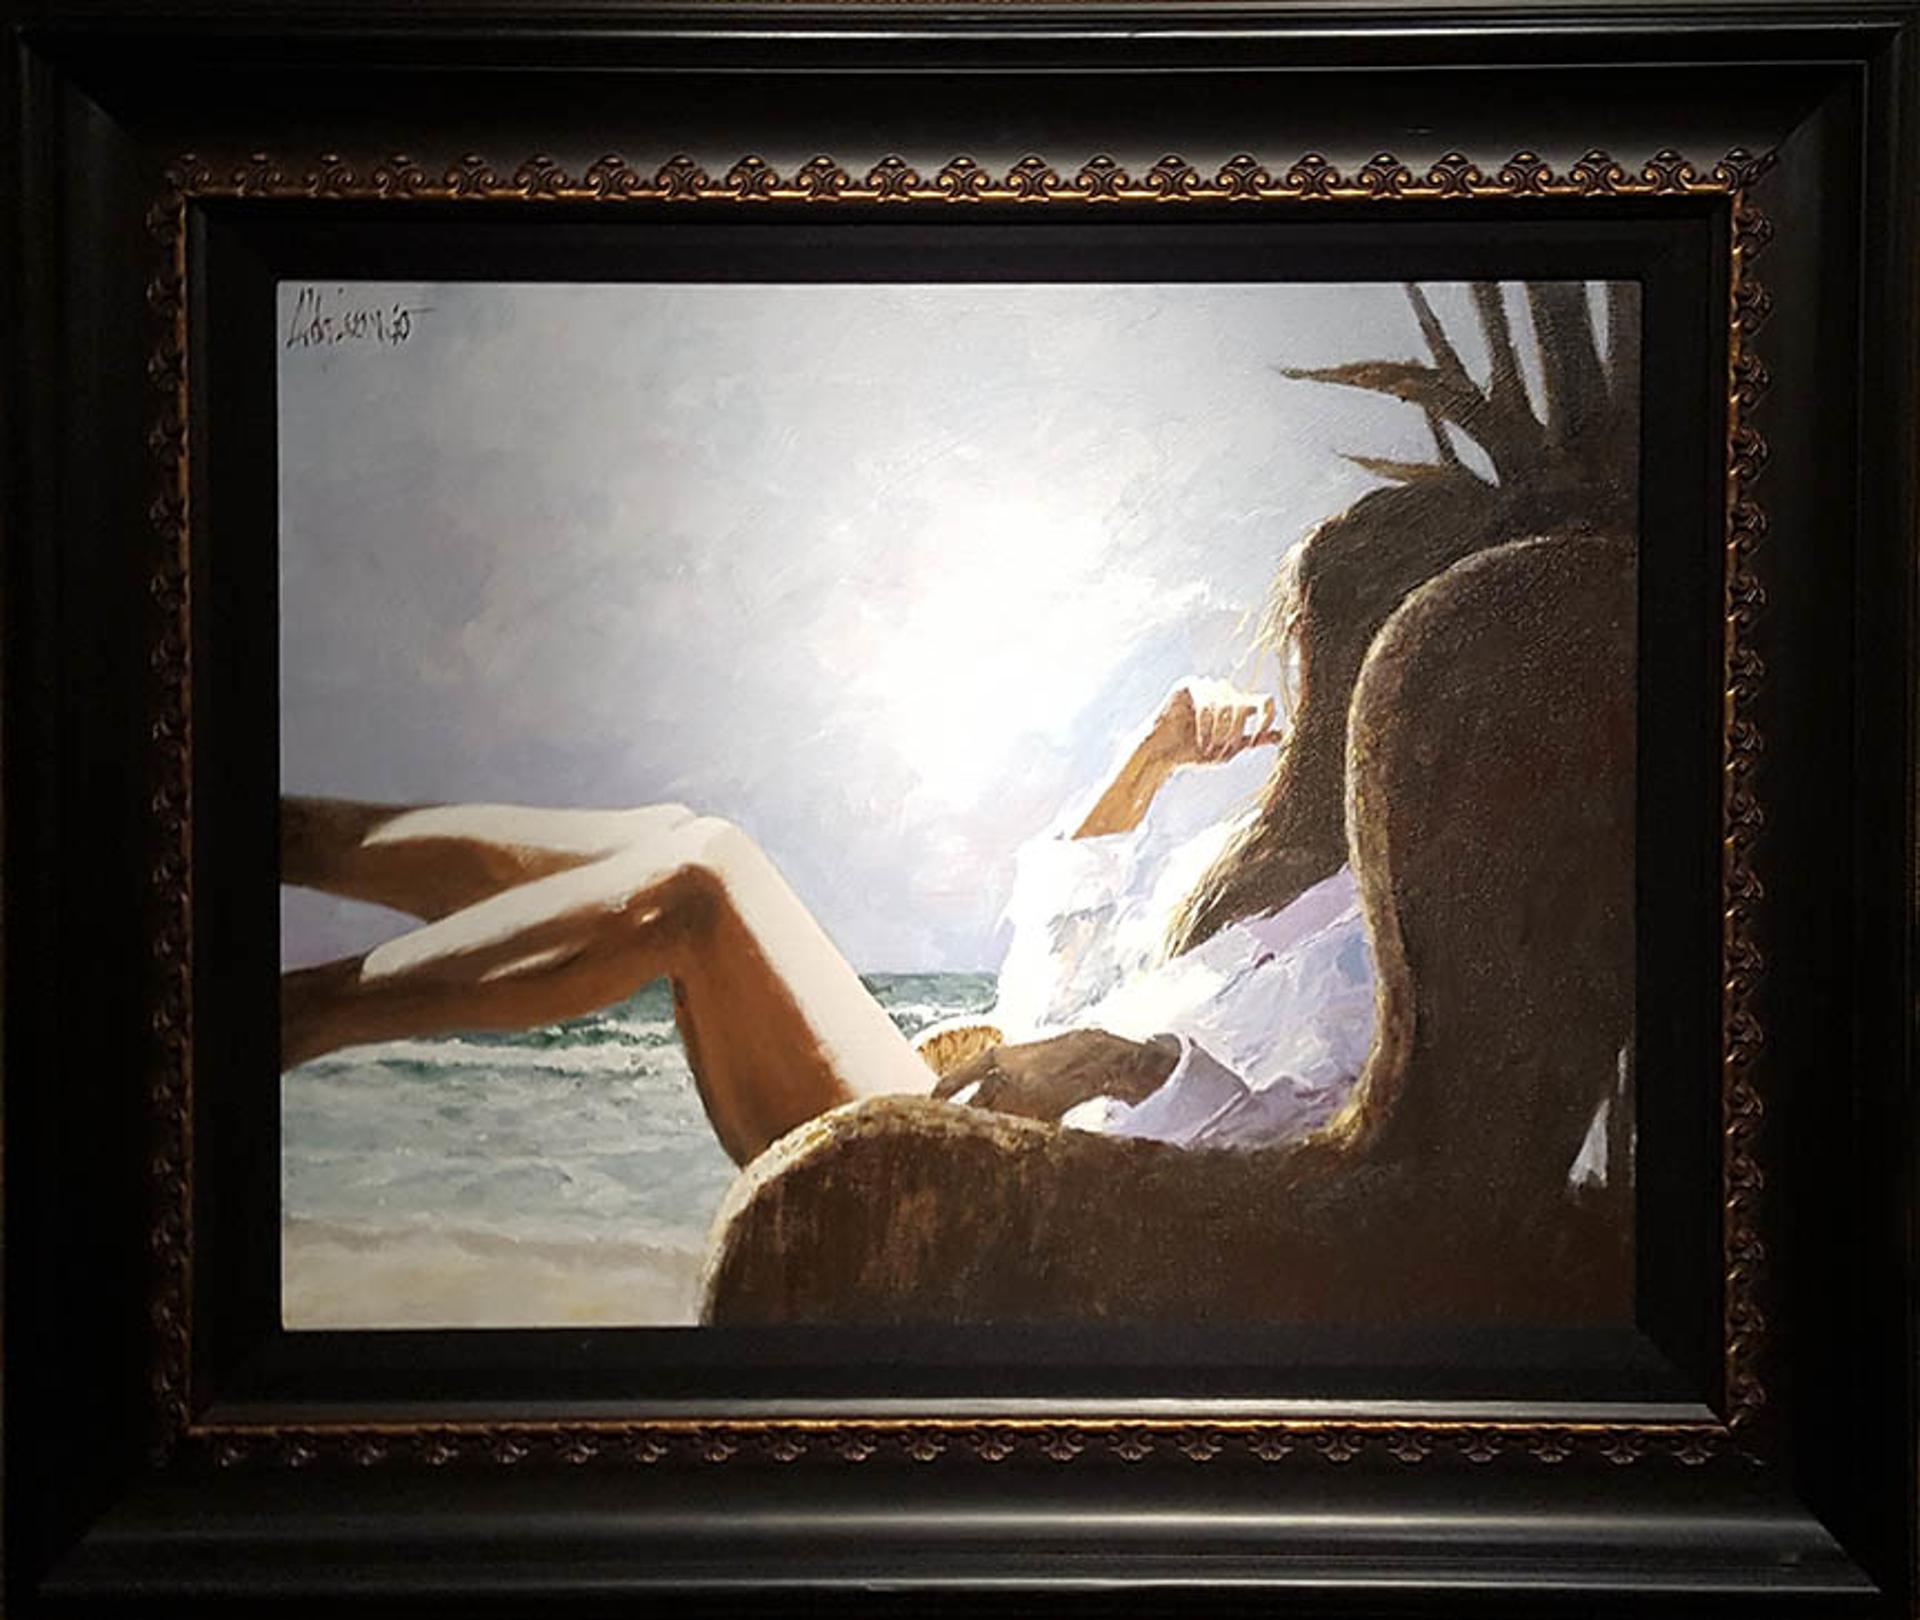 Memories Of Maui by Aldo Luongo